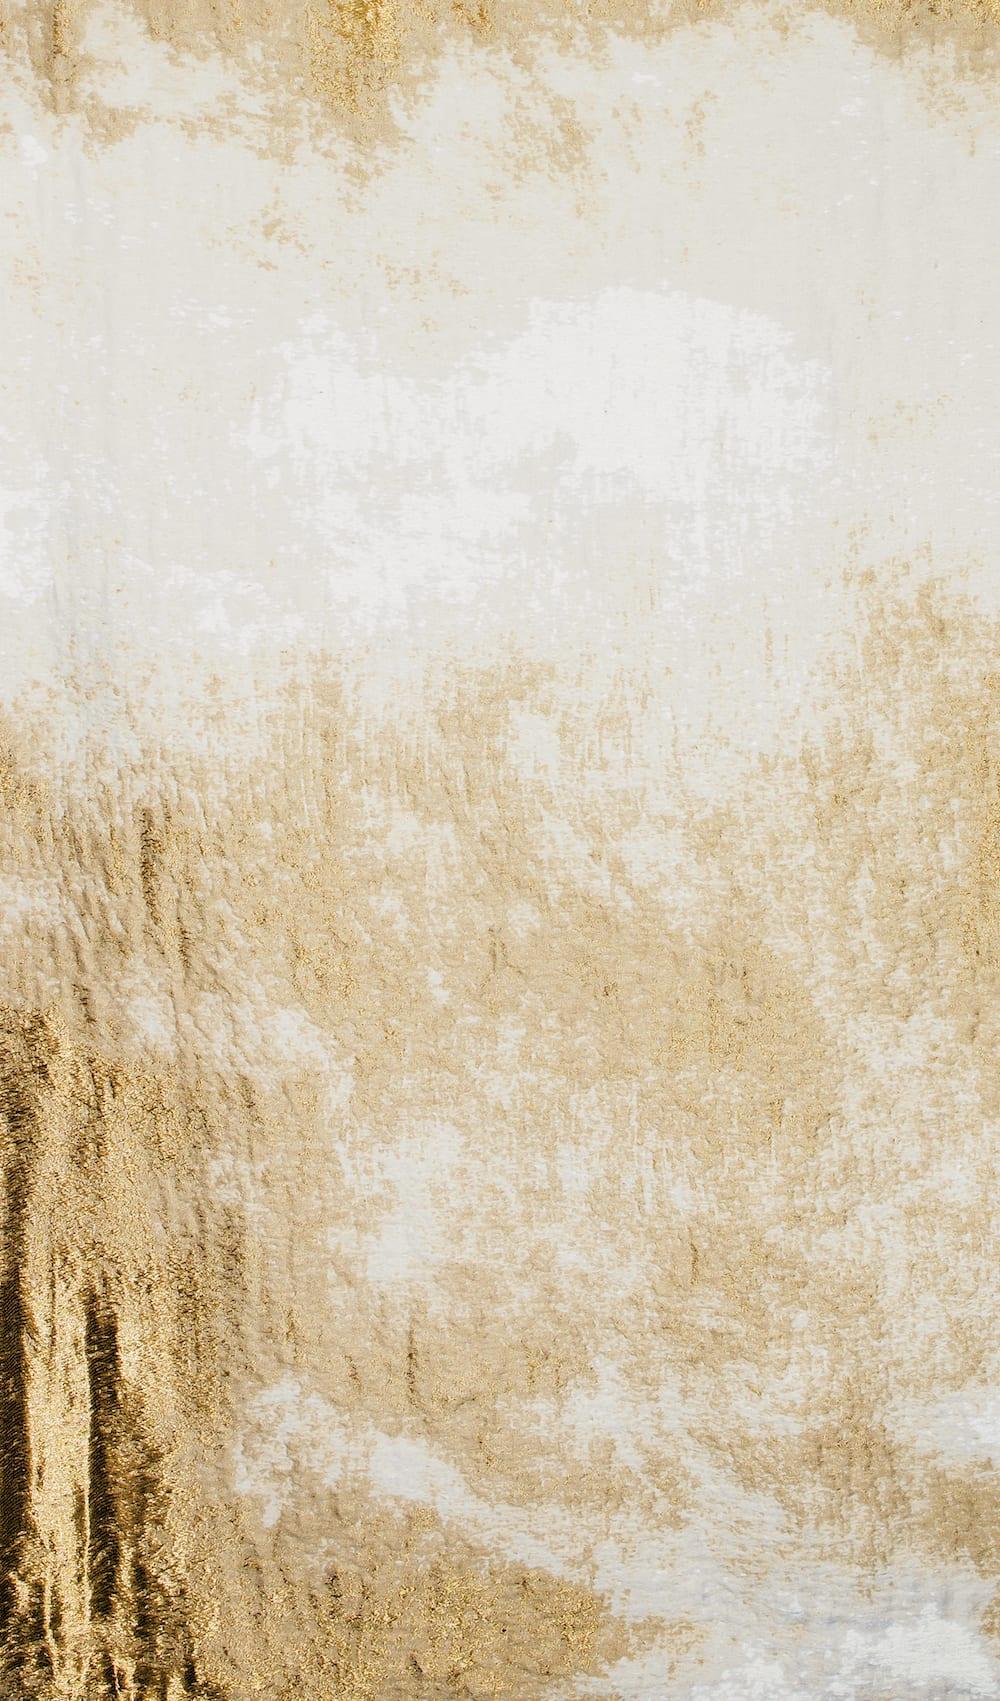 Jan Koen Lomans, Im Abendrot - No I